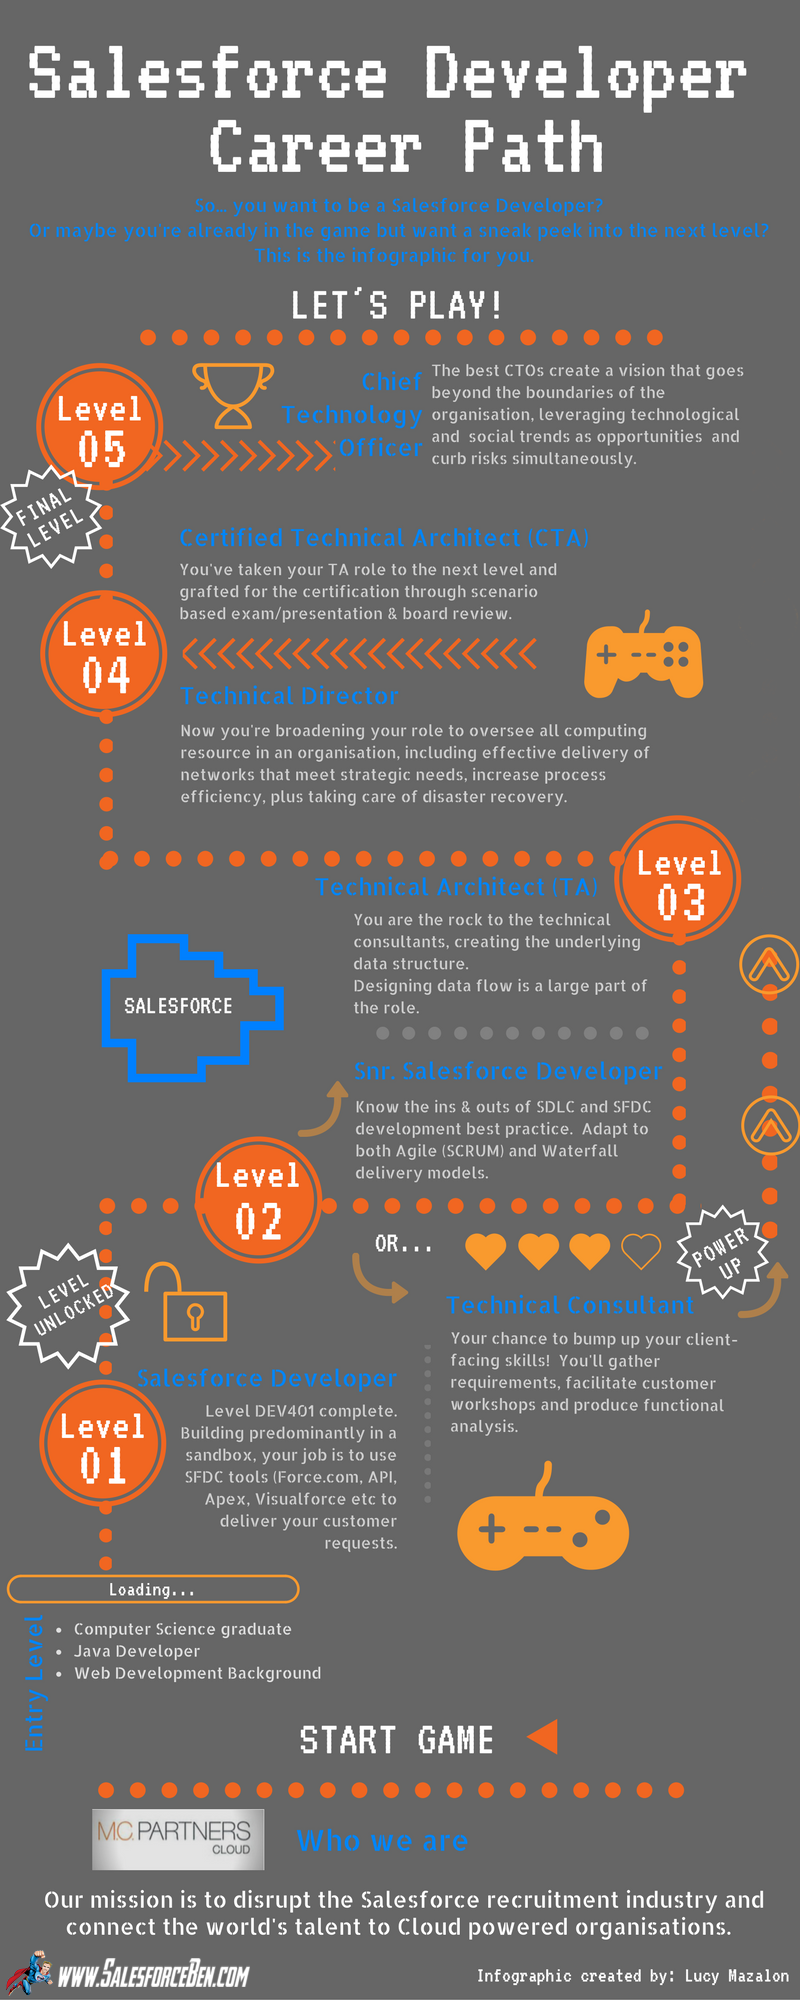 Salesforce Developer Career Path Infographic